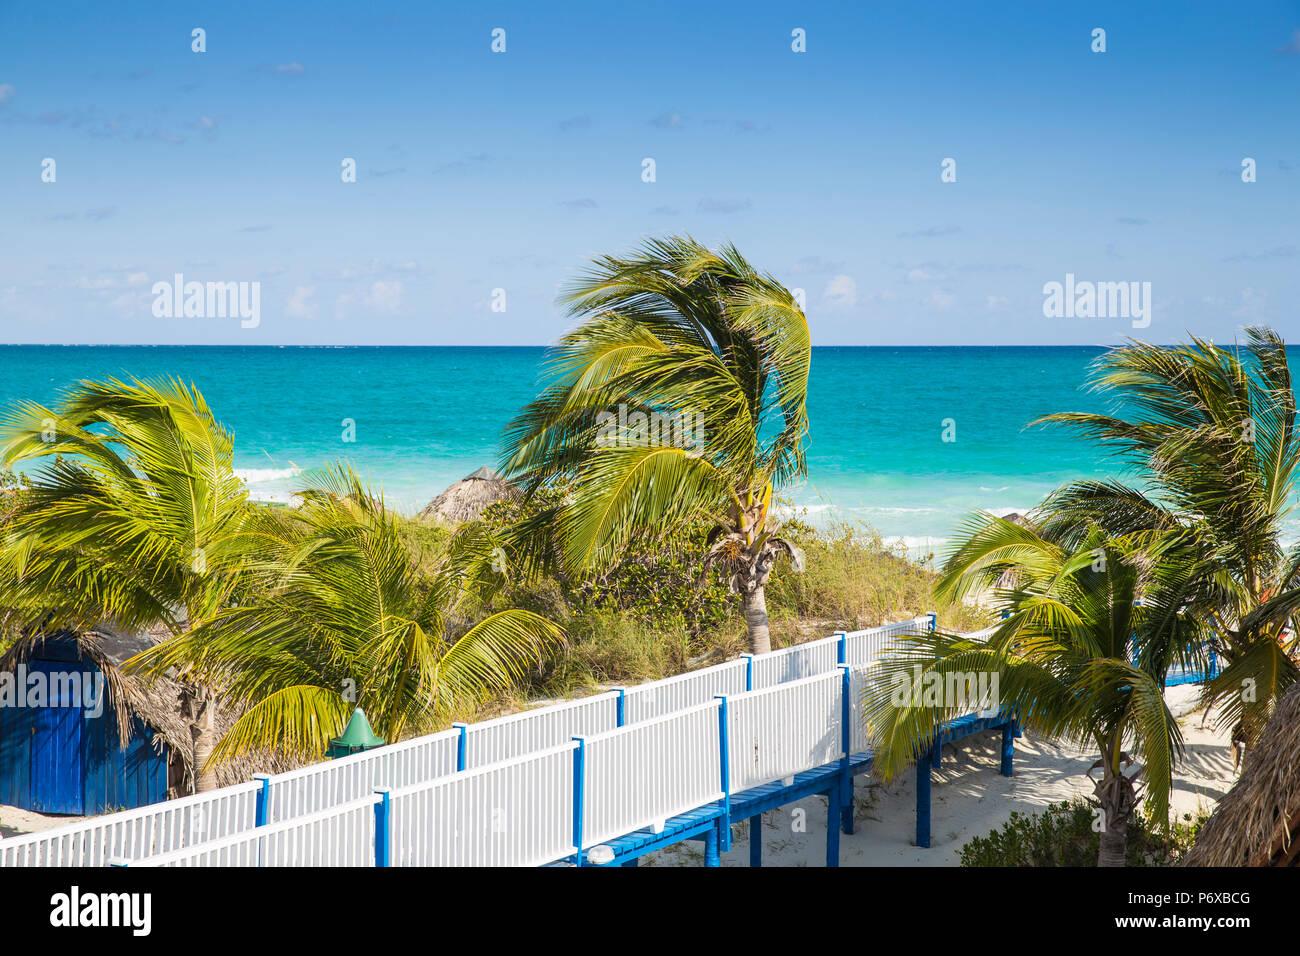 Cuba, Jardines del Rey, Cayo Guillermo, Playa Pilar Immagini Stock